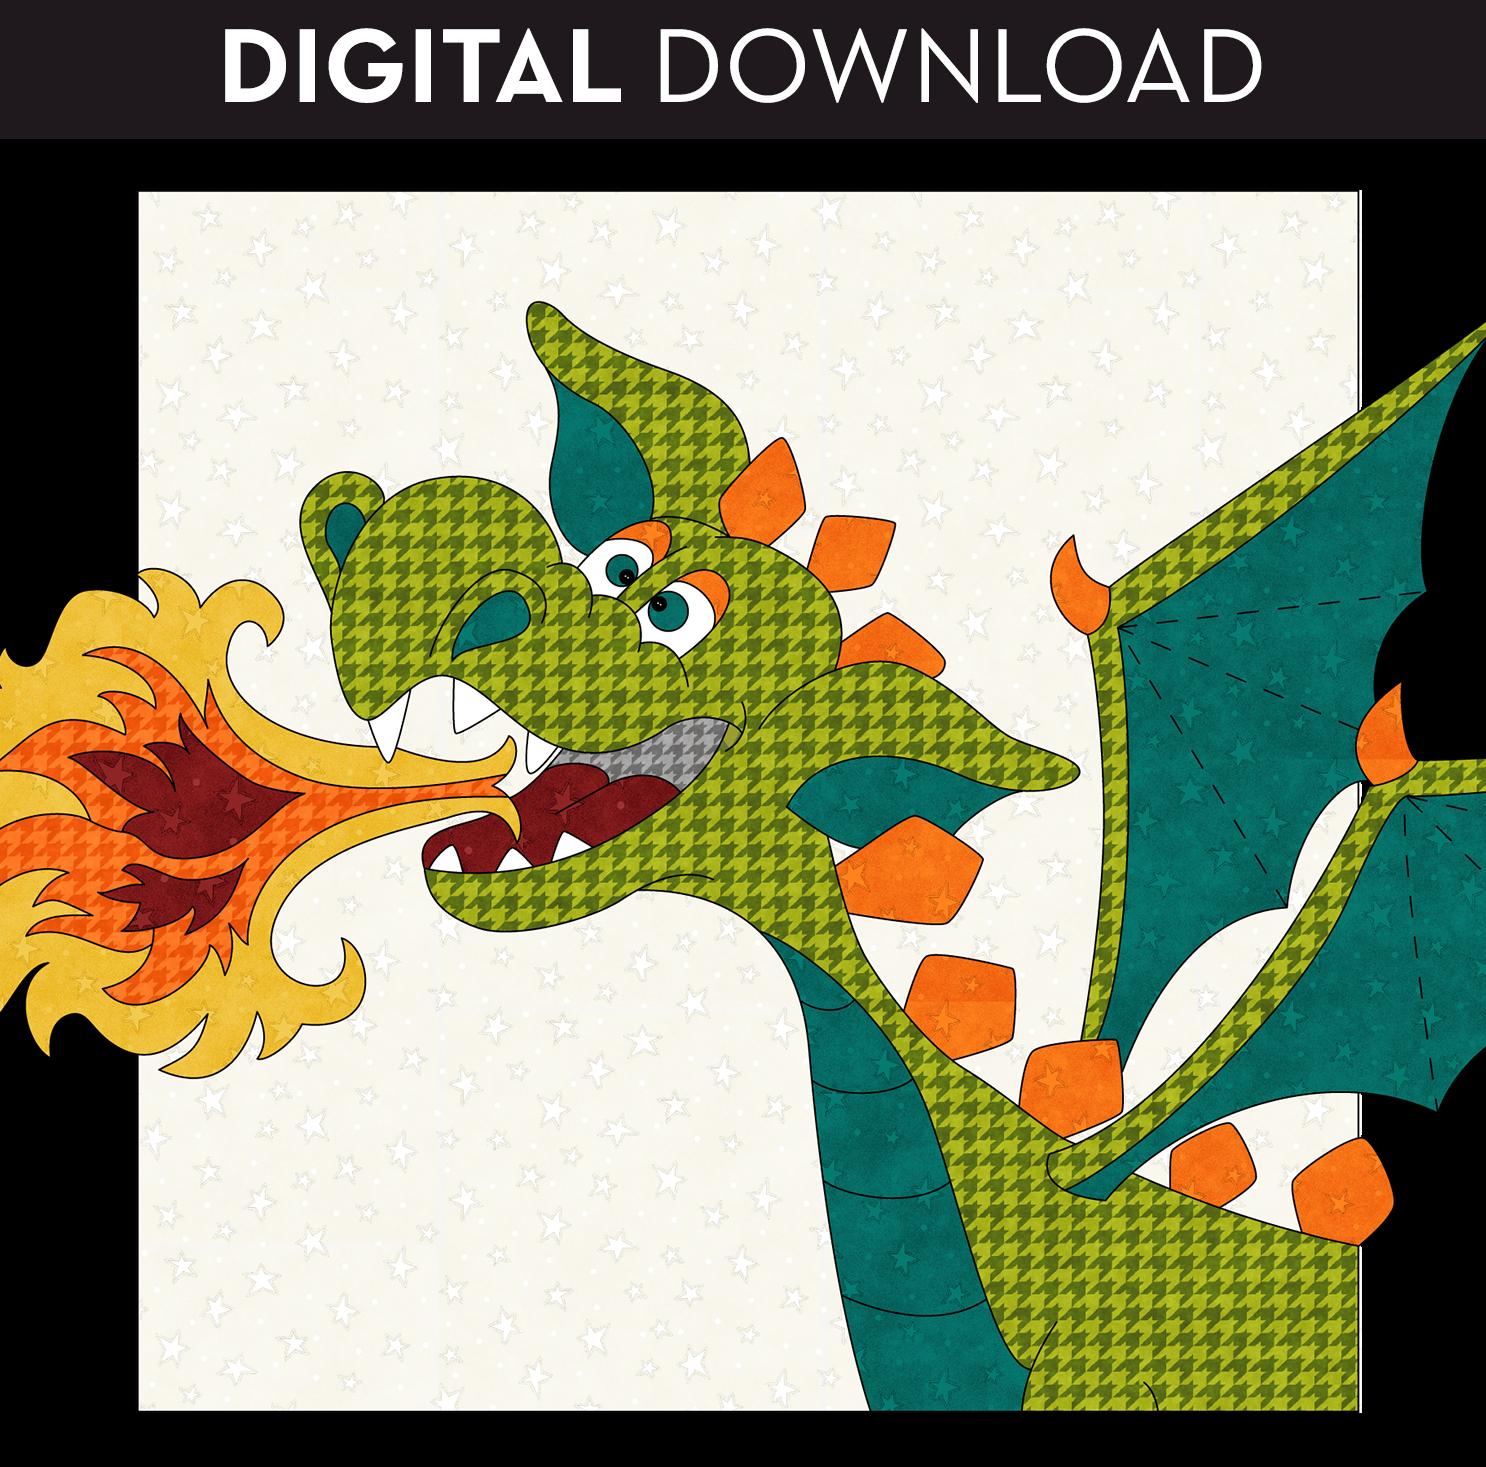 Fire Dragon Applique - Download